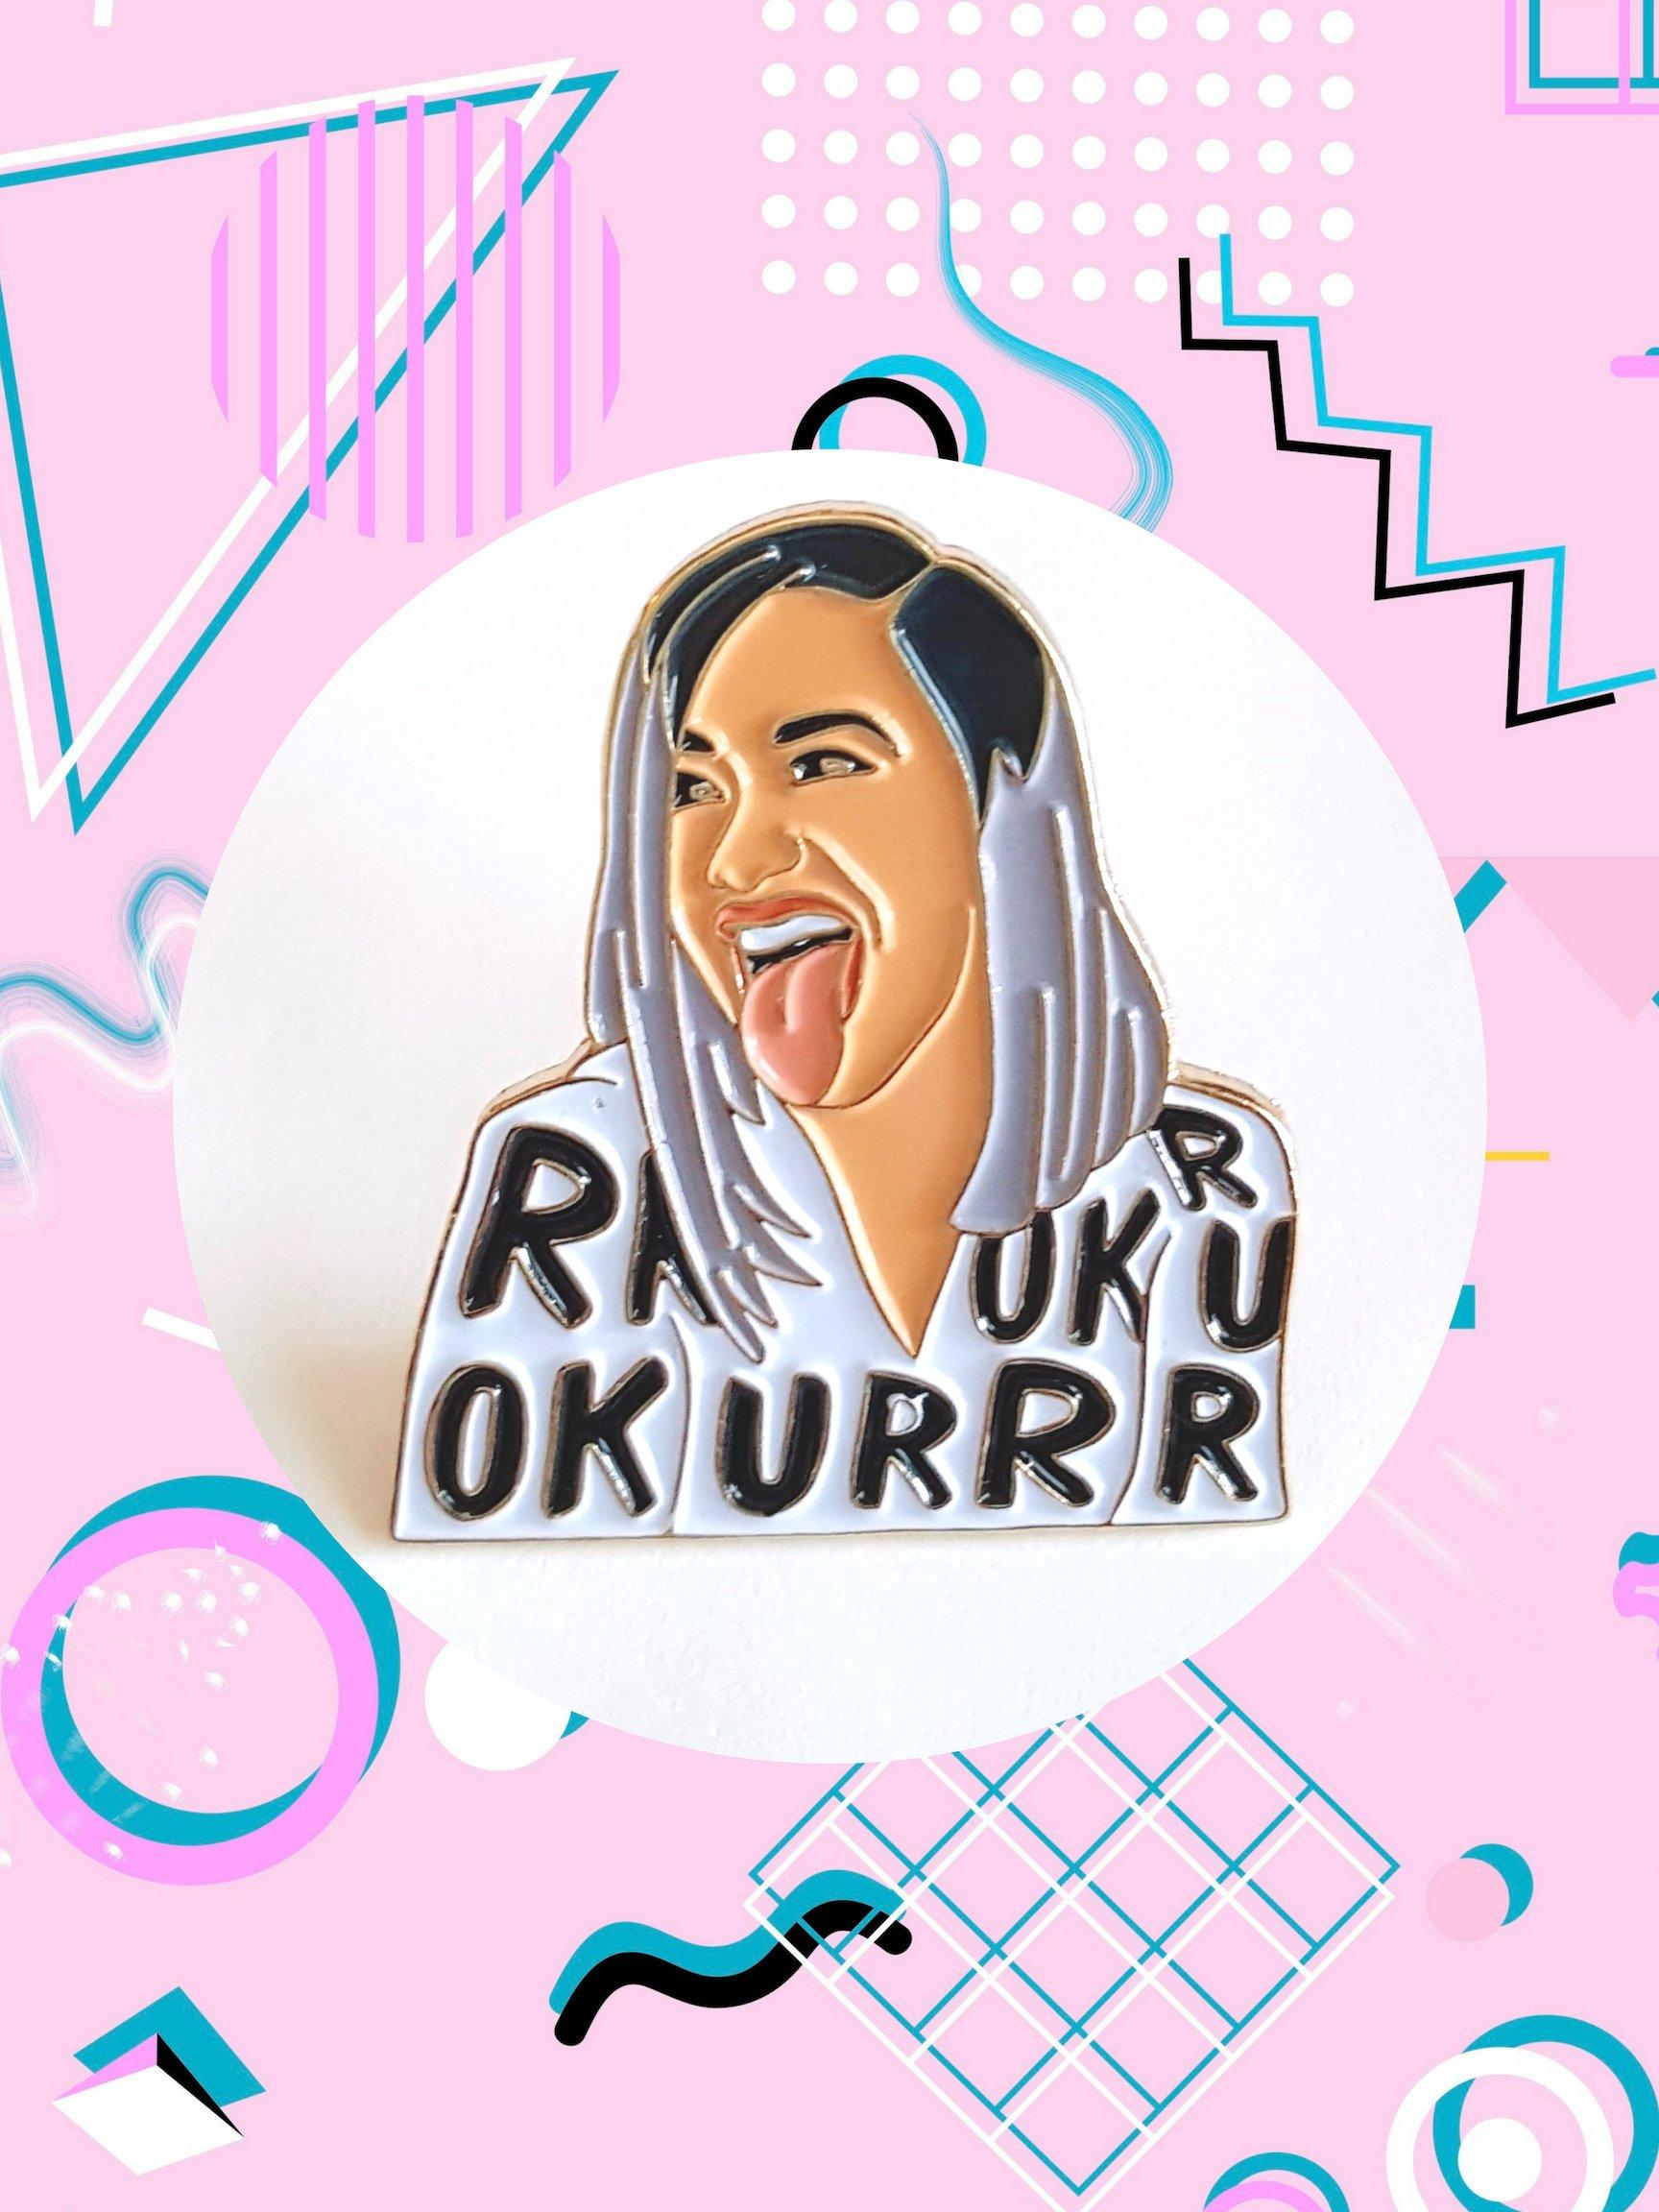 Cardi B Wallpaper Cartoon : cardi, wallpaper, cartoon, Cardi, Okurrr, Stranger, Things, Sticker,, Feminist, Fashion